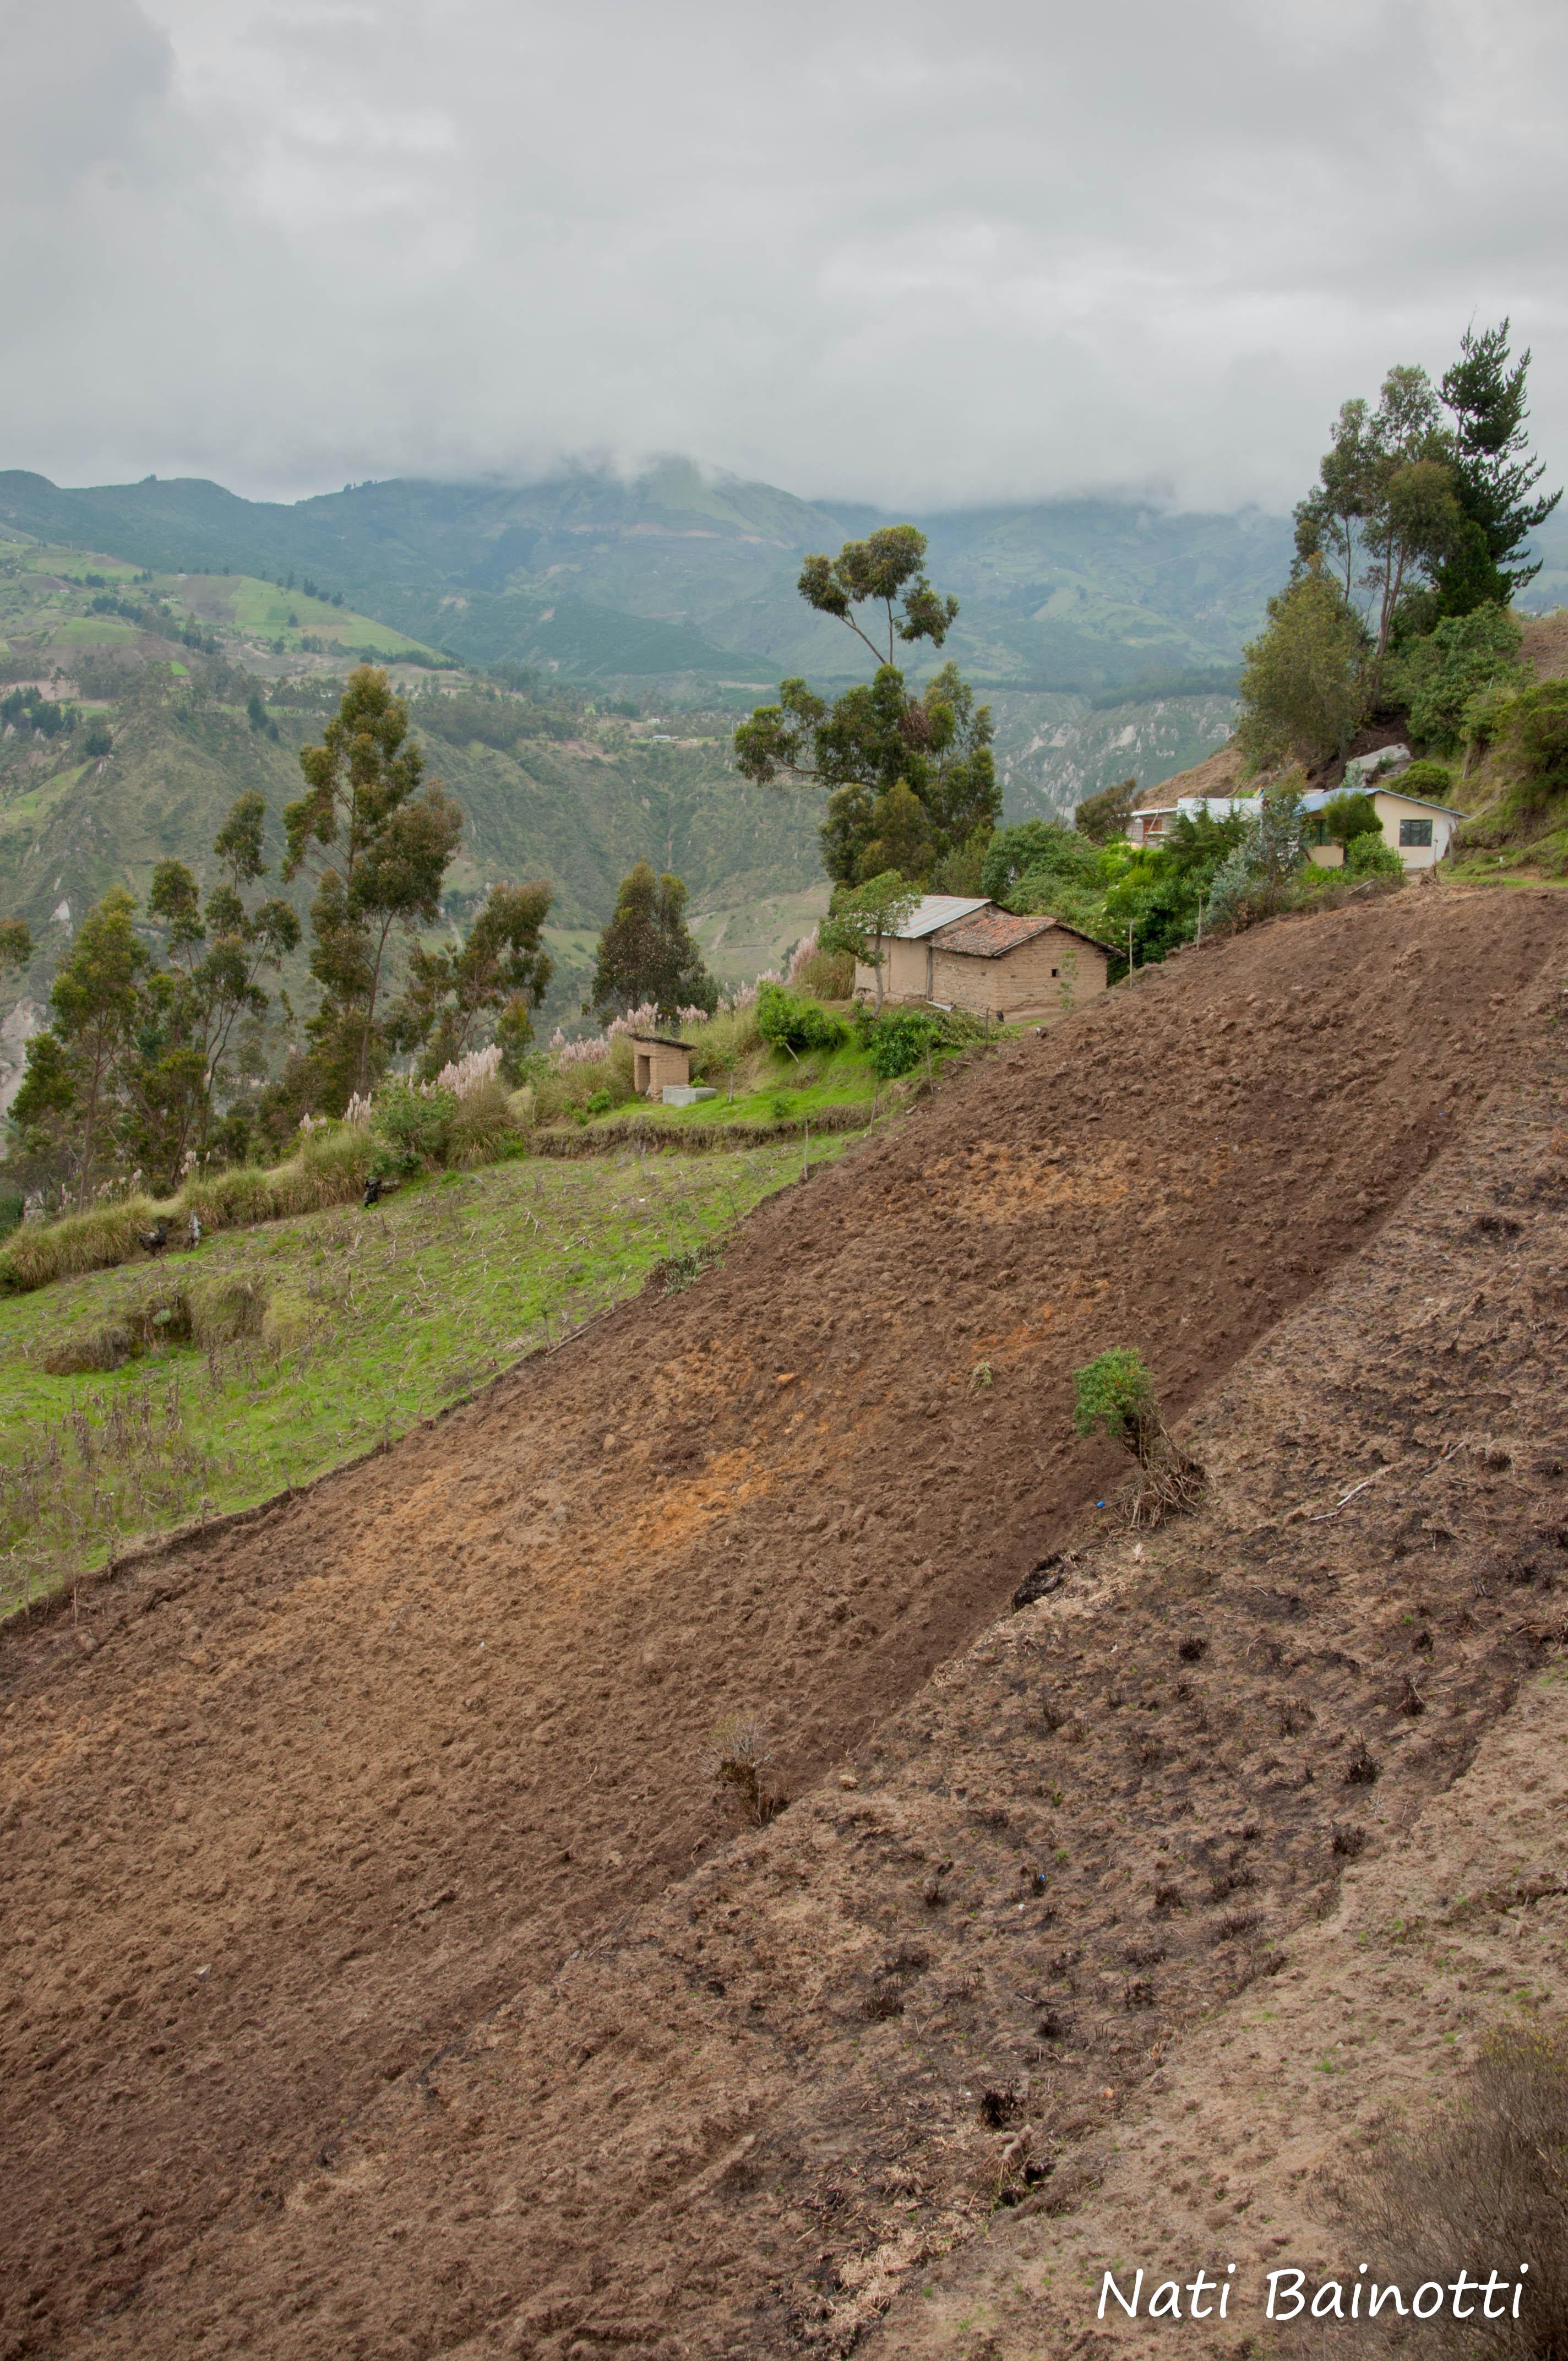 quilotoa-ecuador-nati-bainotti-mi-vida-en-una-mochila-9